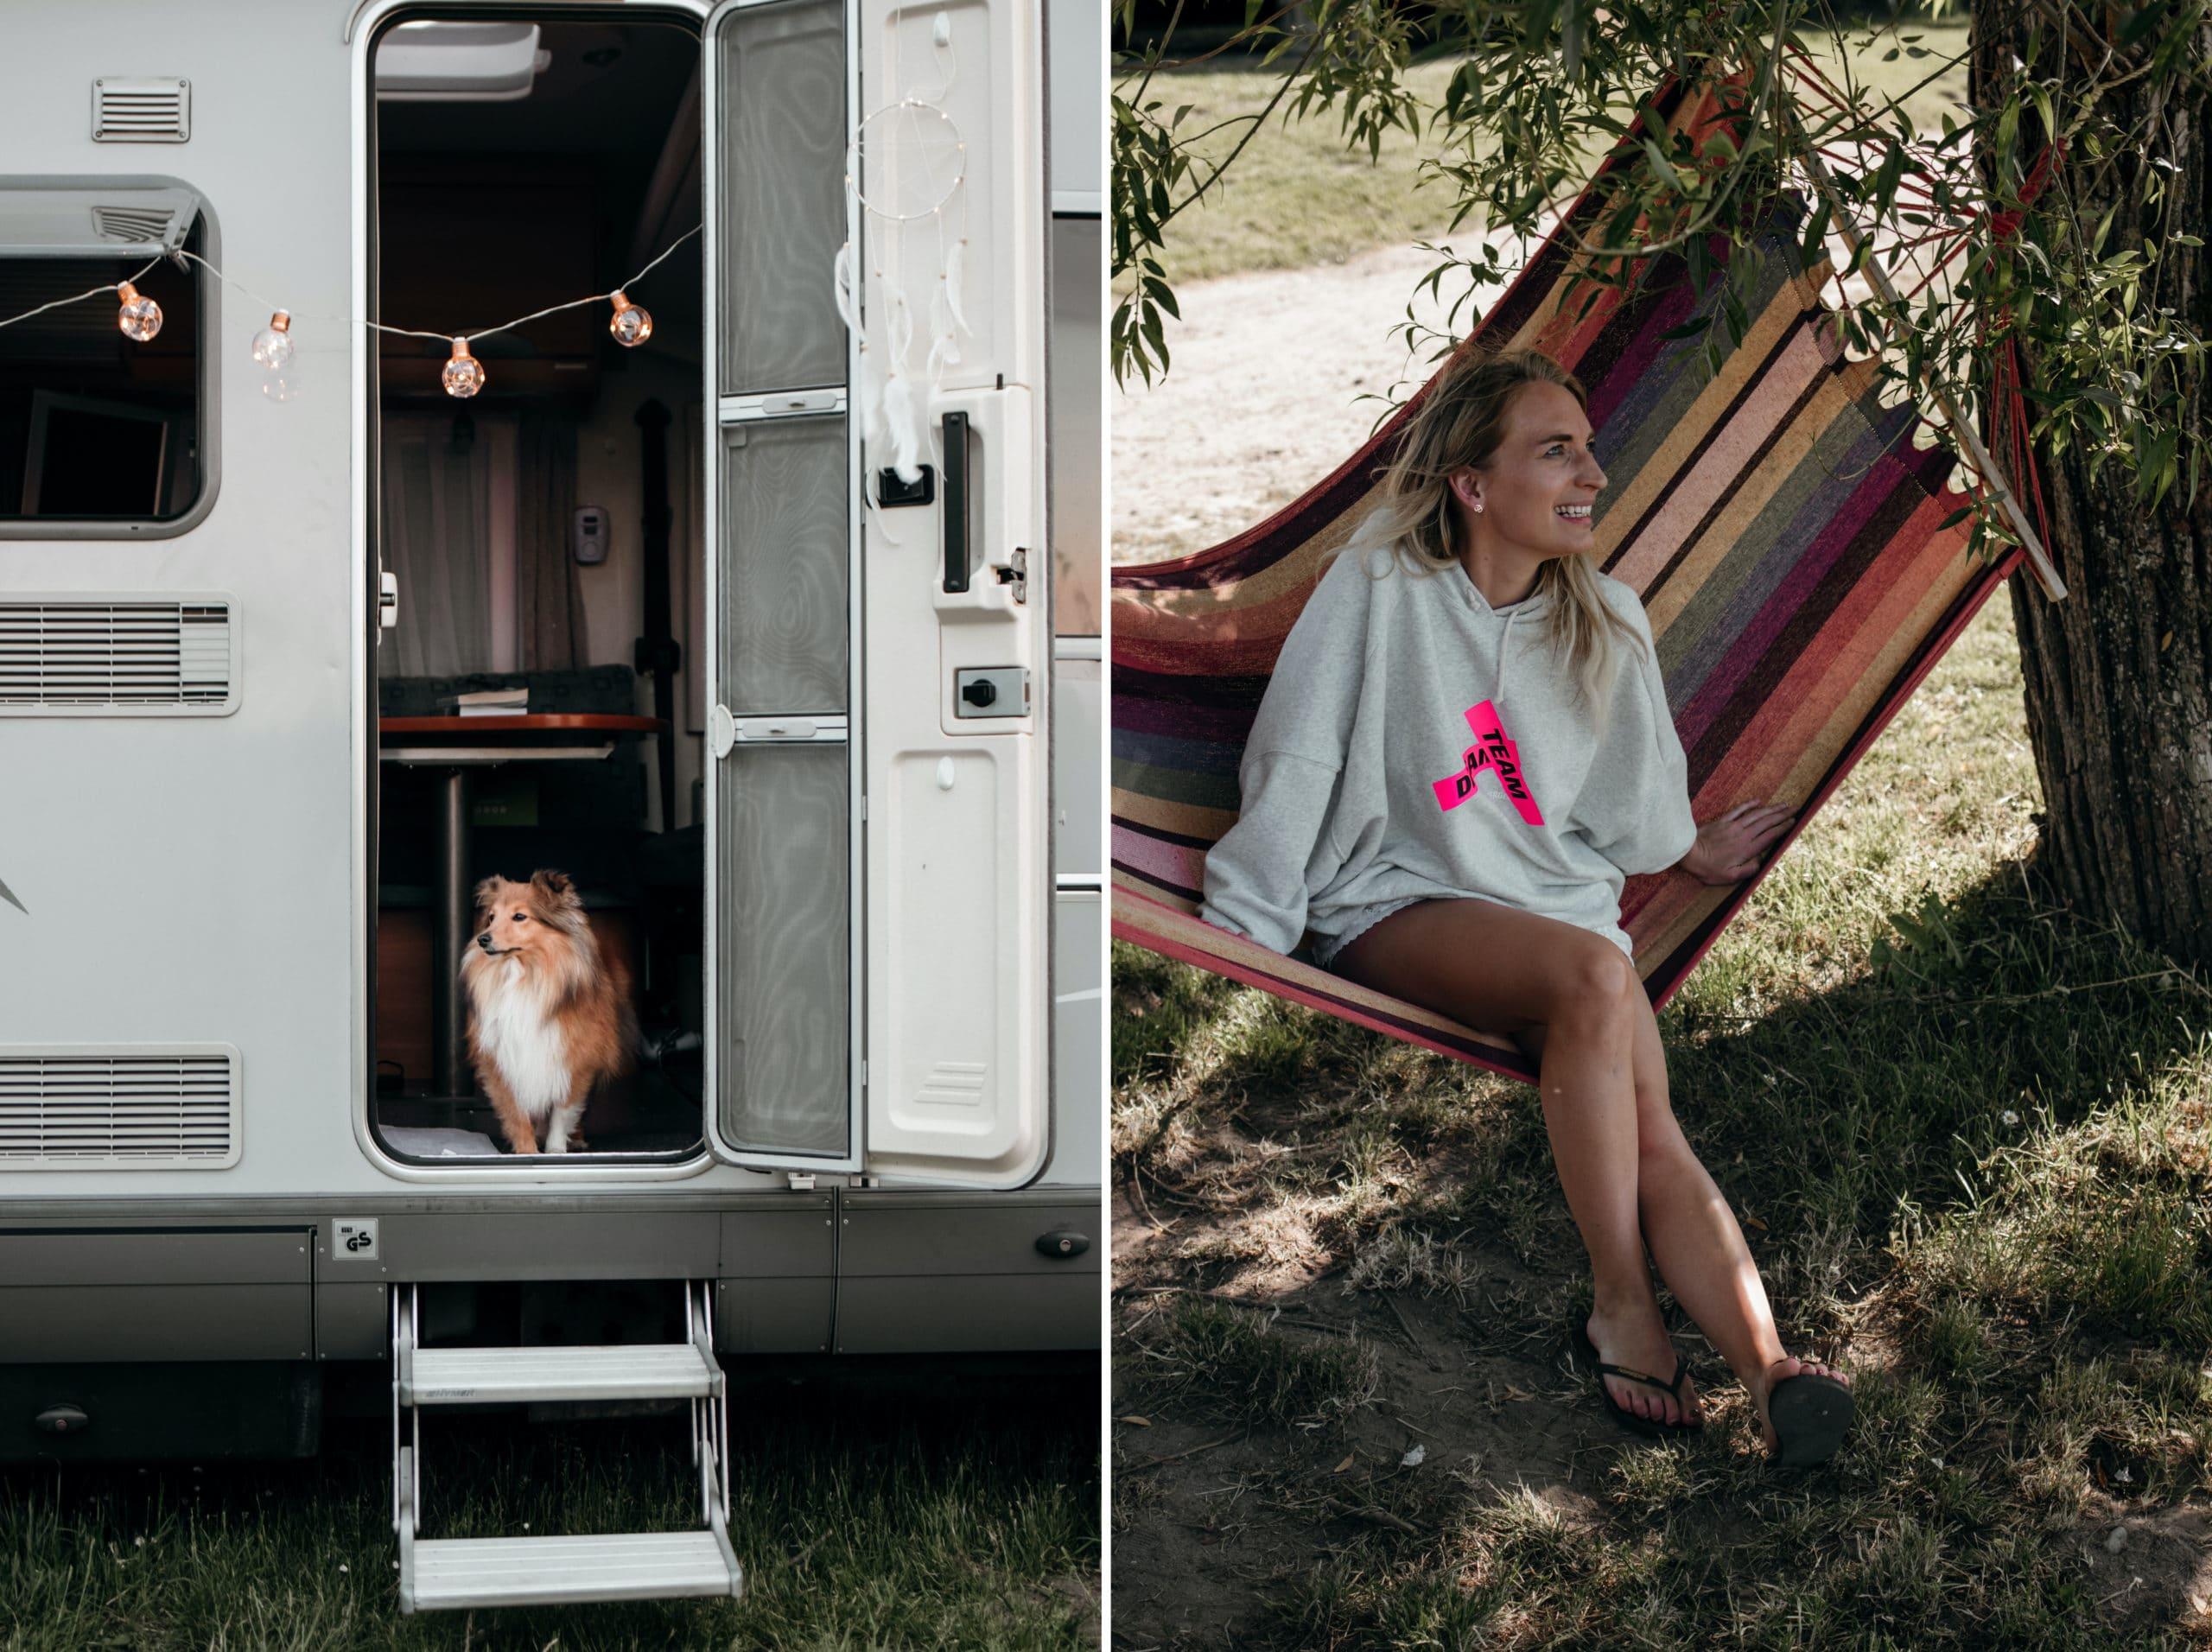 campingplatz mecklenburgische seenplatte hängematte